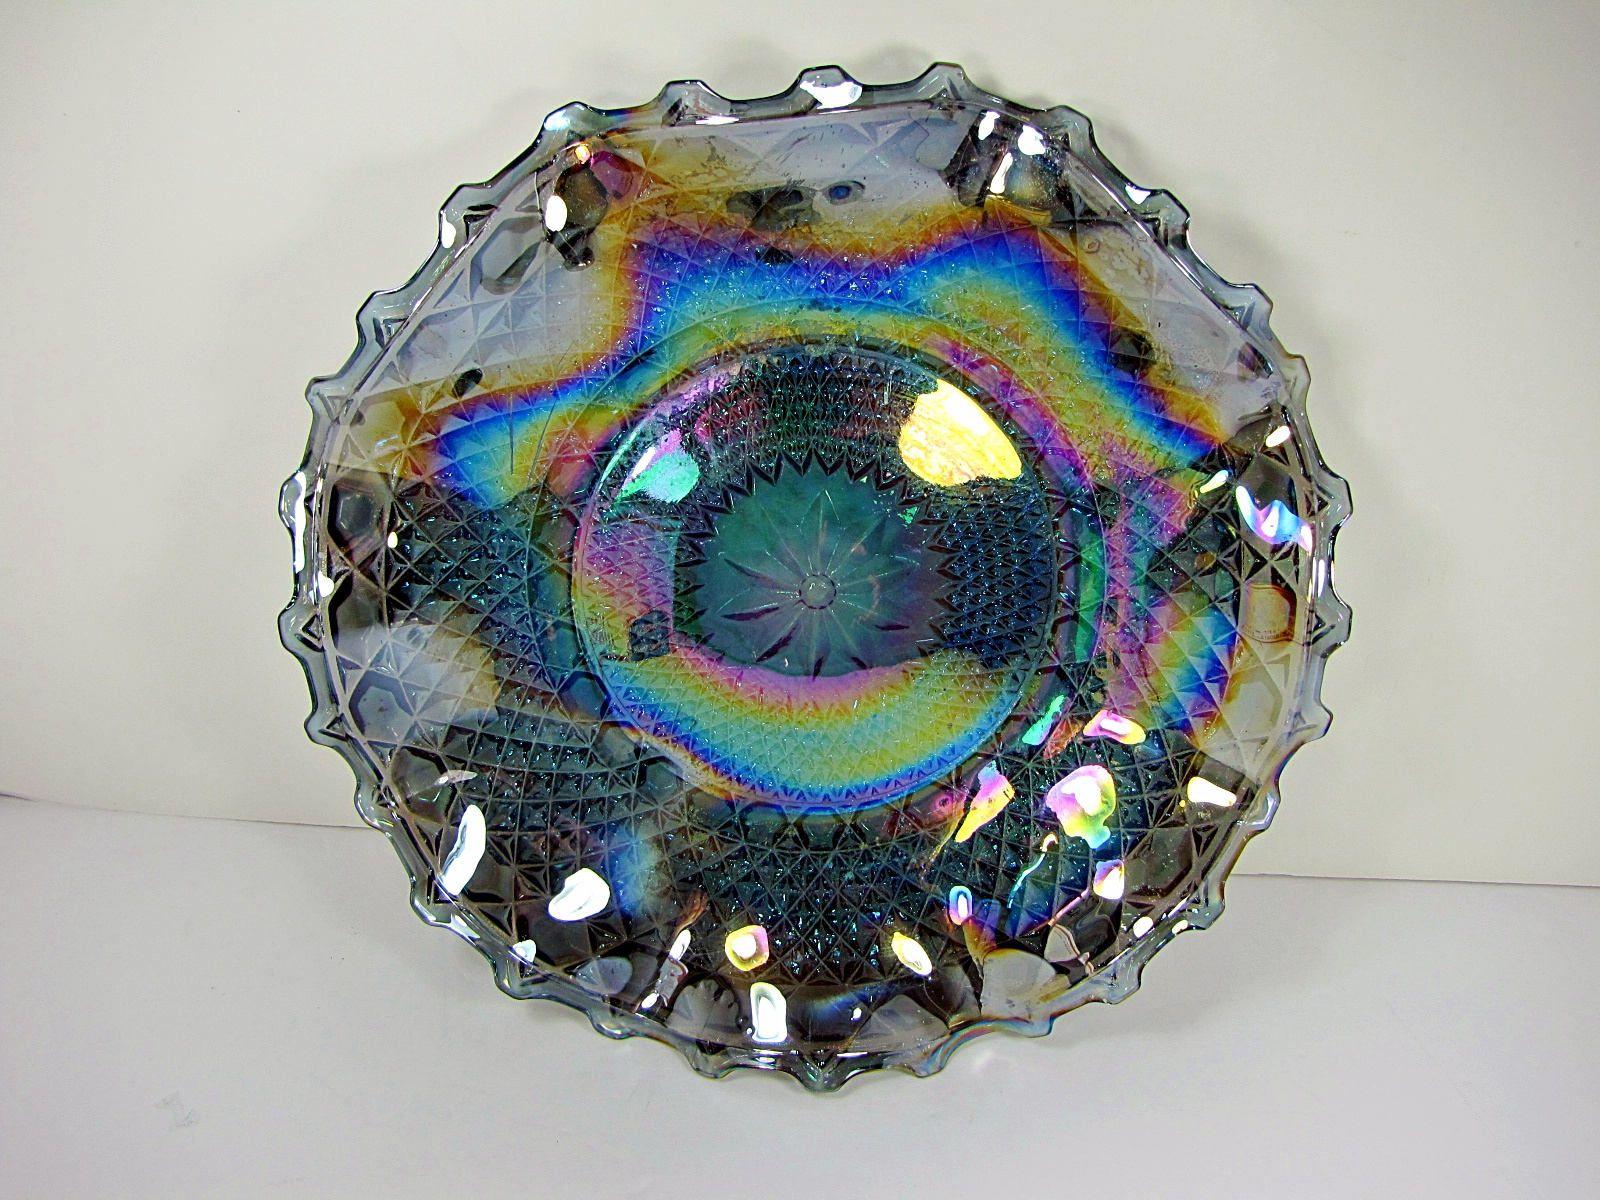 40a7895a99195f74562237049a037576 Top Result 50 Unique Diamond Fire Glass Image 2017 Pkt6